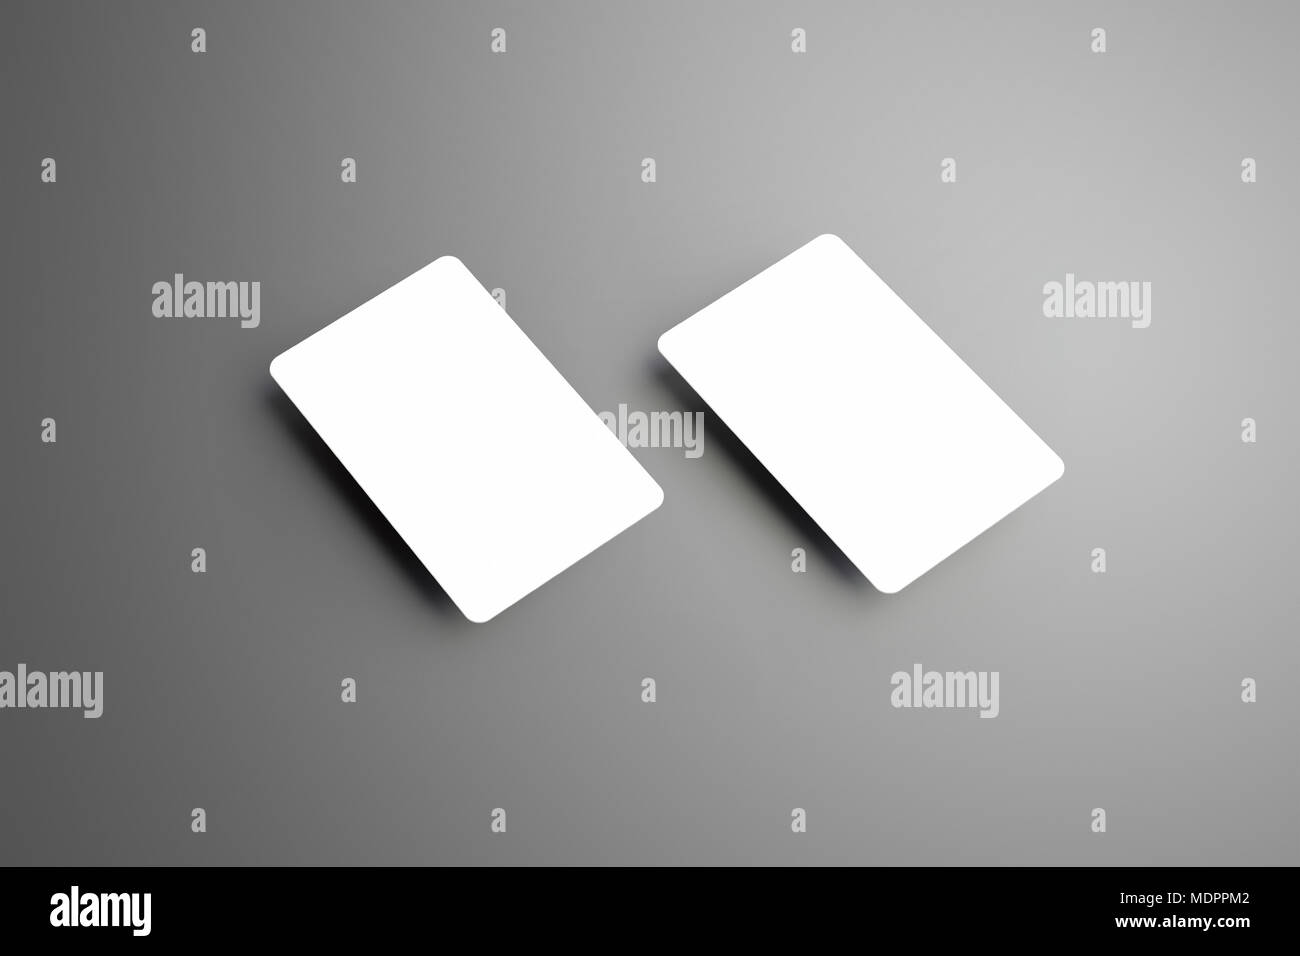 White Mockup Stockfotos & White Mockup Bilder - Seite 2 - Alamy